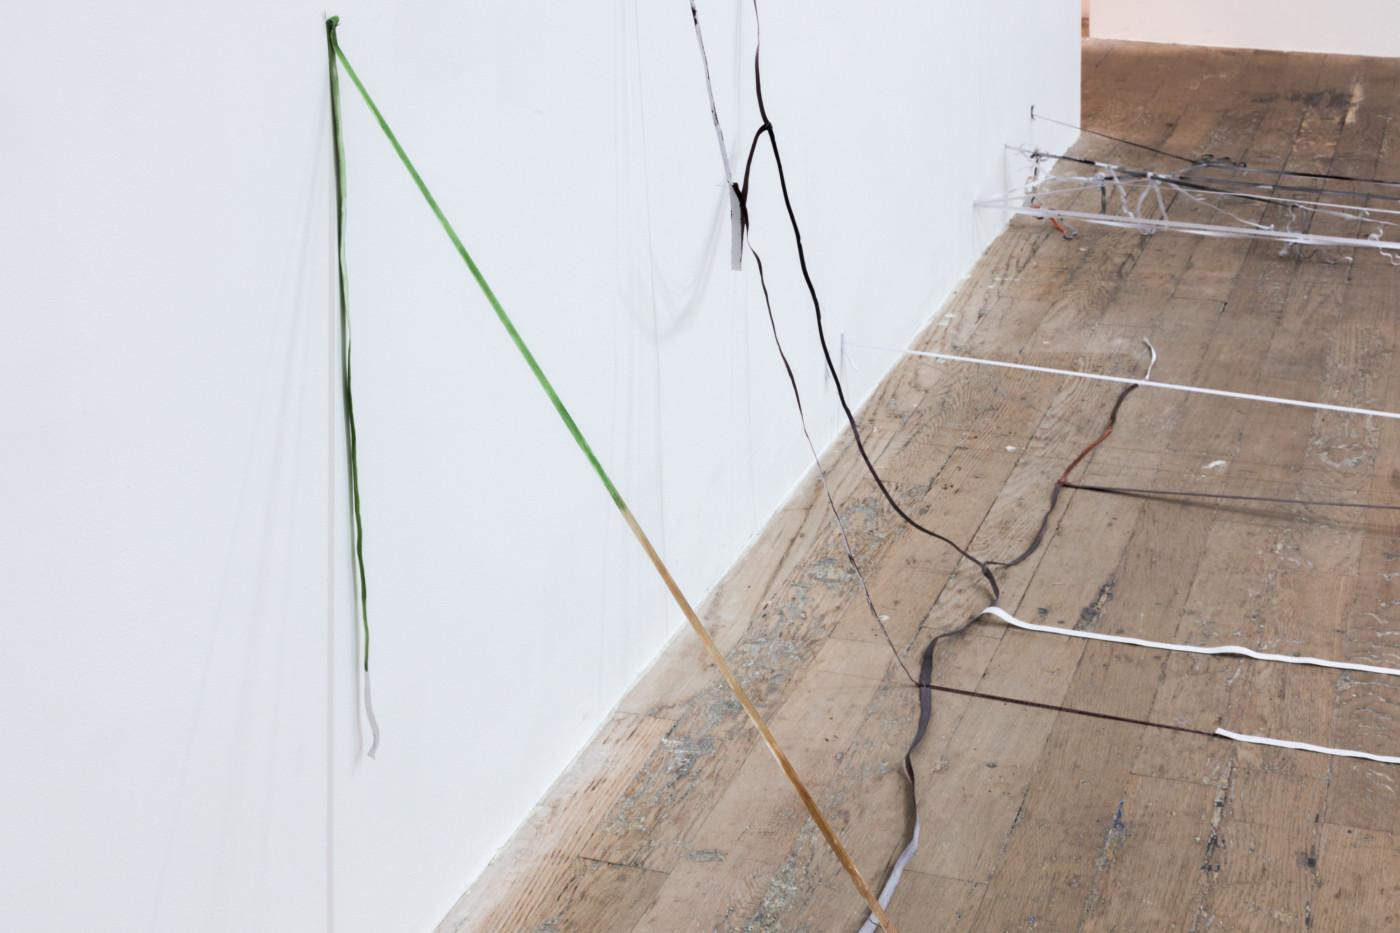 OLGA BALEMA  11 , 2019 Elastic band, paint, glue, nails, staples <br<95.25 × 114.30 × 100.33 cm / 37.5 × 45 × 39.5 in - High Art Gallery Paris